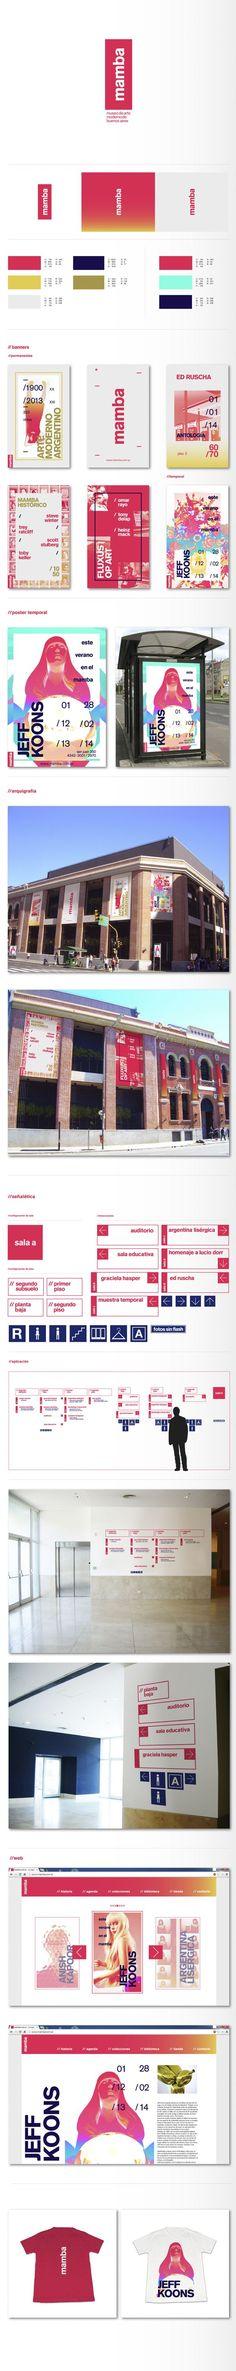 Museo de Arte Moderno de Buenos Aires | Identidad by Martin Pignataro, via Behance